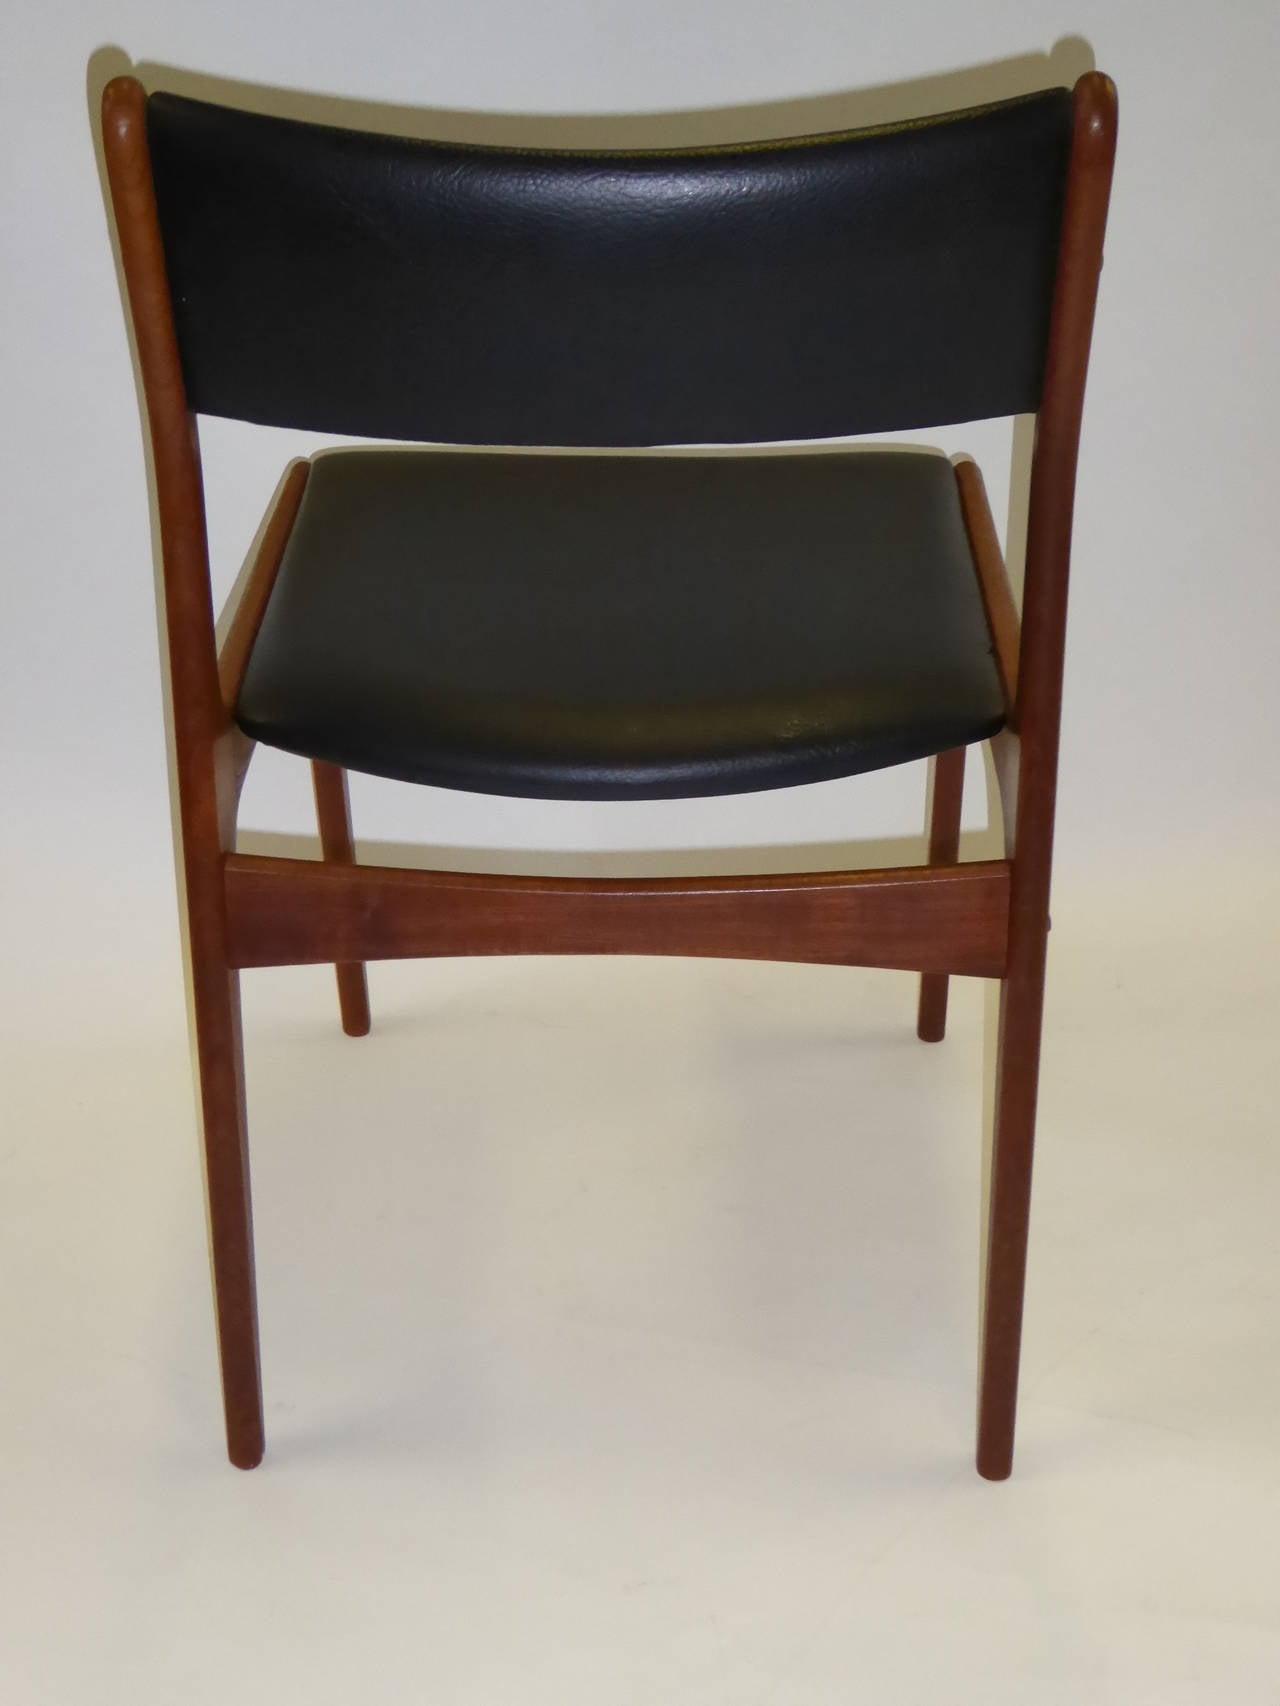 Johannes Andersen for Uldum Mobelfabrik Danish Teak Dining Chairs In Good Condition For Sale In Miami, FL